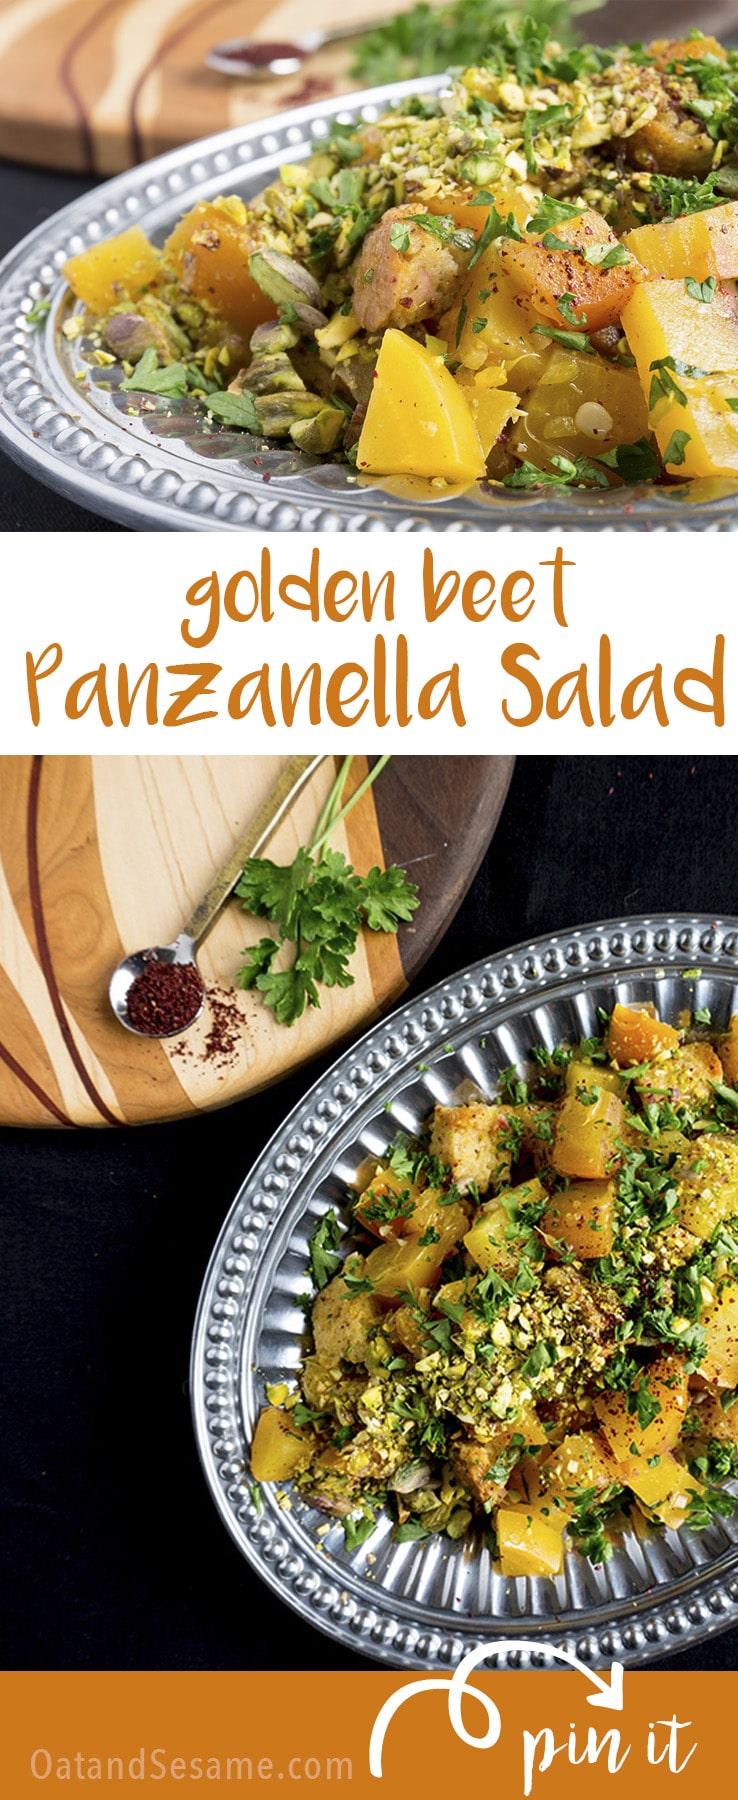 Golden Beet Panzanella Salad - tangy and citrusy with fresh golden beets! | | #BEETS | #VEGETARIAN | #Recipes at OatandSesame.com